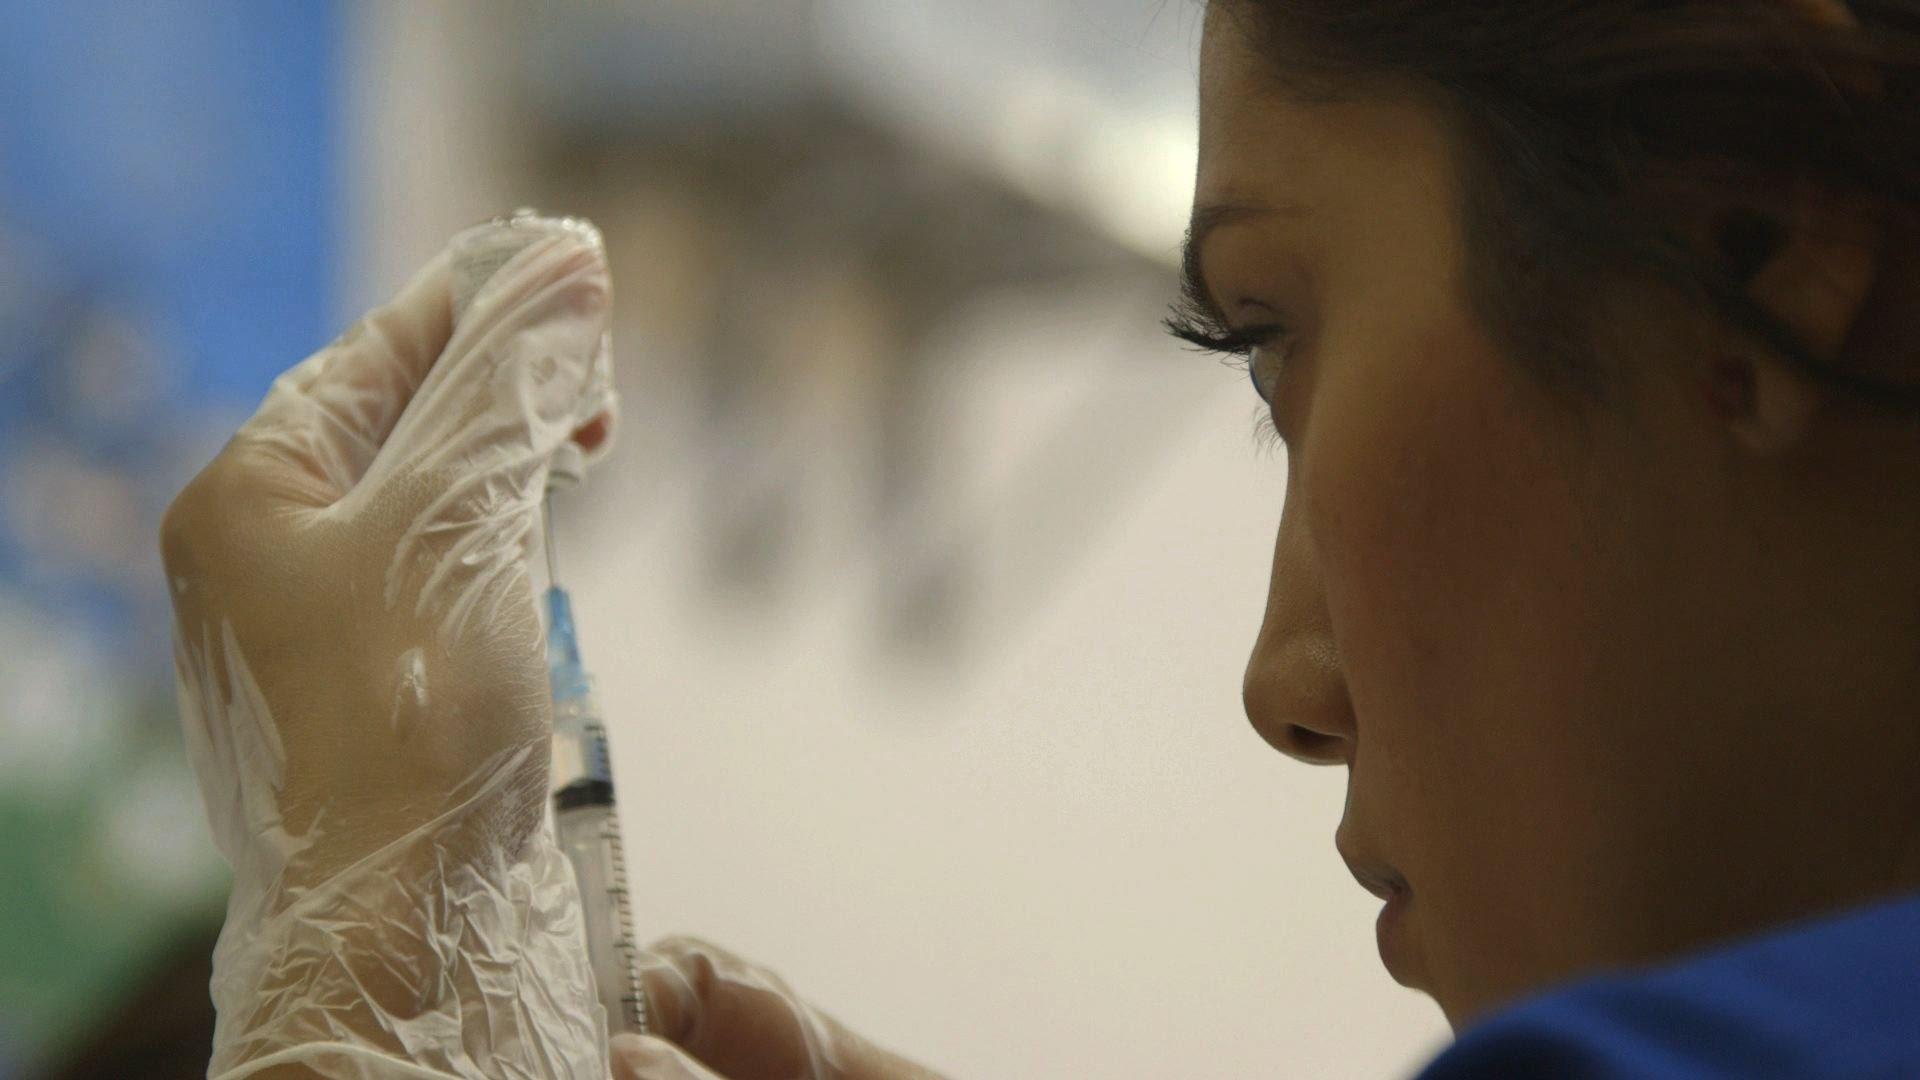 Residents Urged to Get Flu Shot